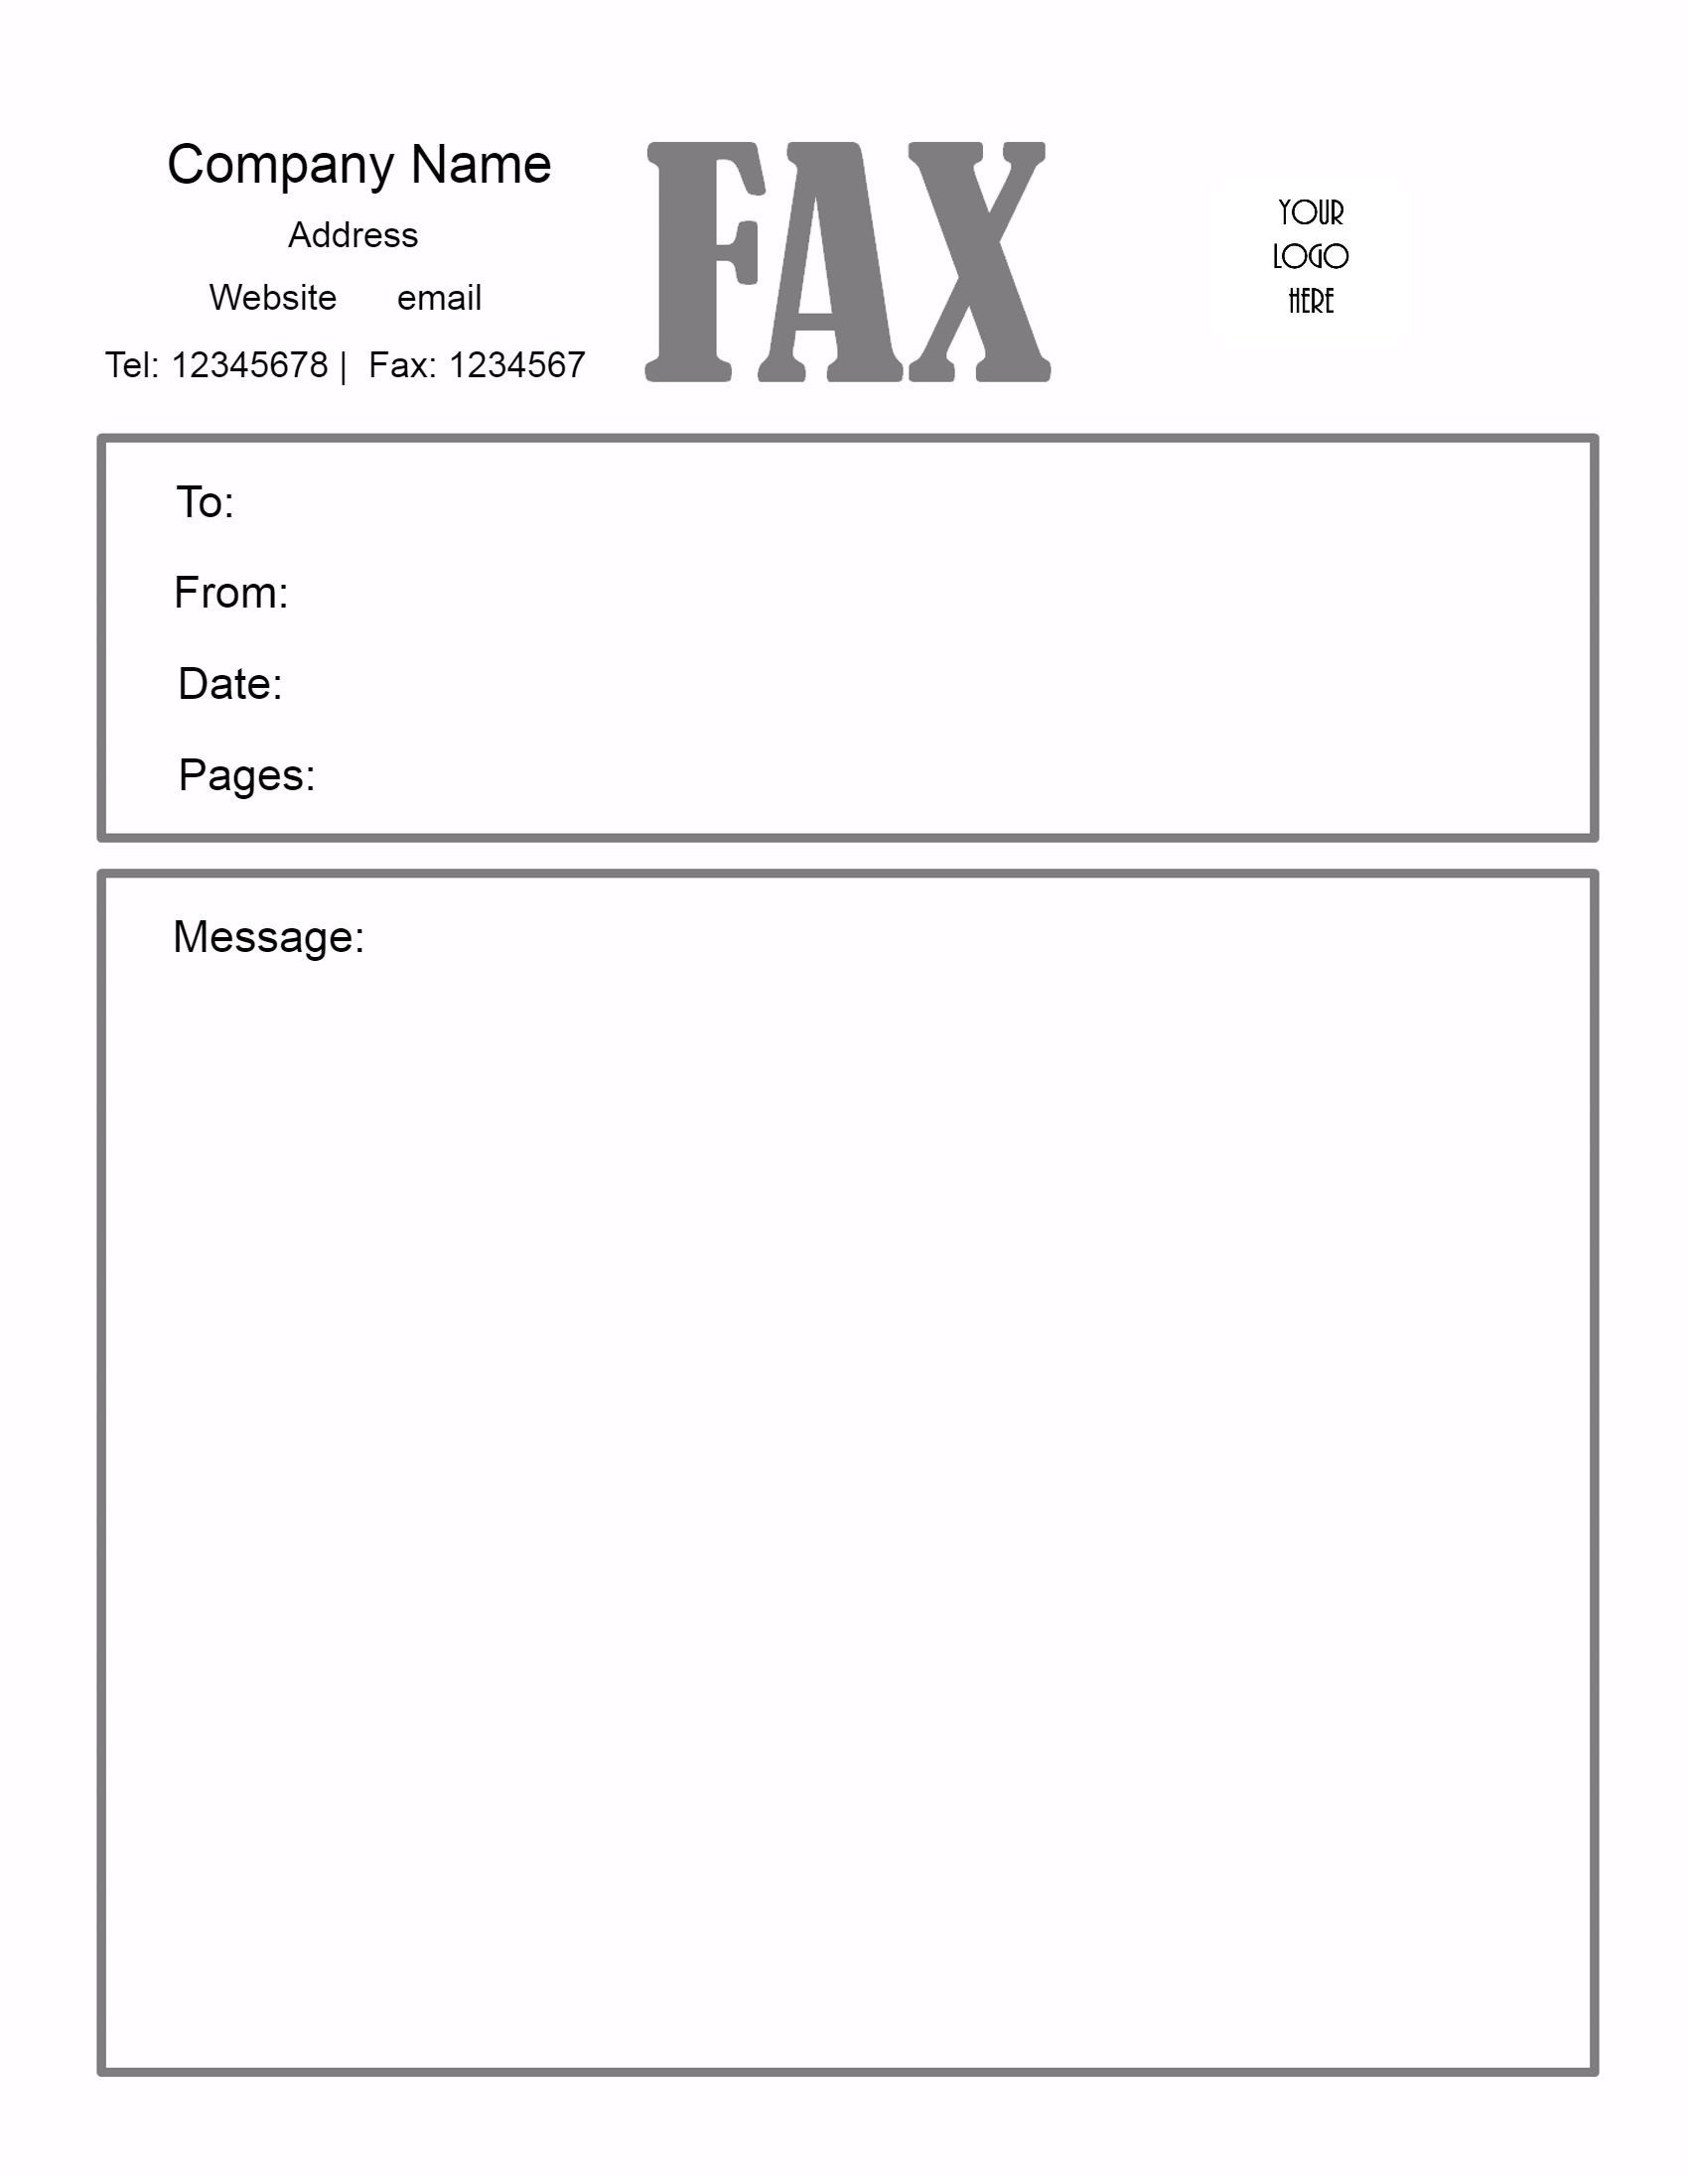 Fax Cover Sheet – Download Fax Cover Sheet, Fax Cover Sheet Template - Free Printable Message Sheets